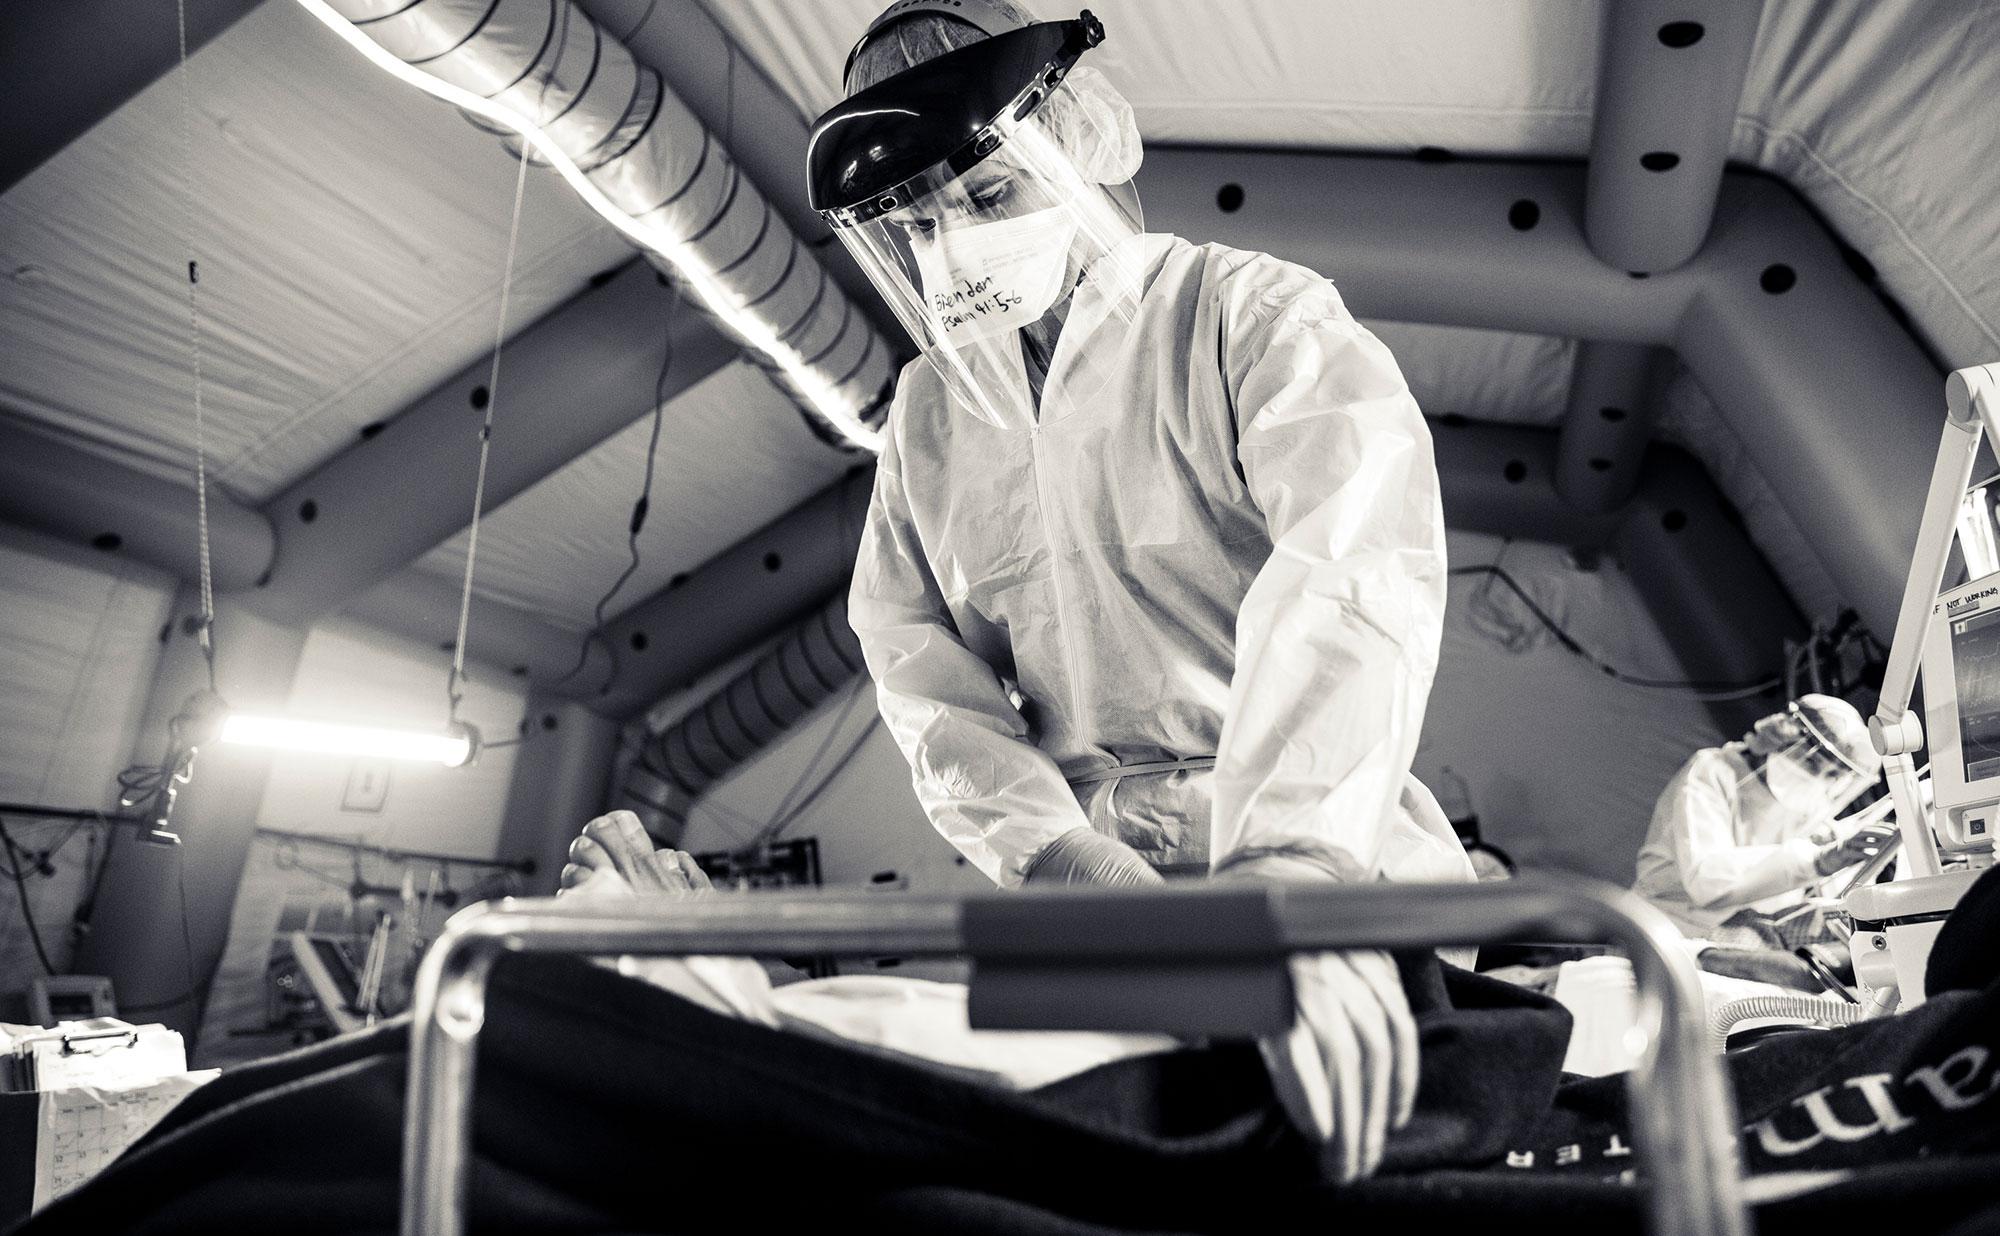 Nurse preparing for shift